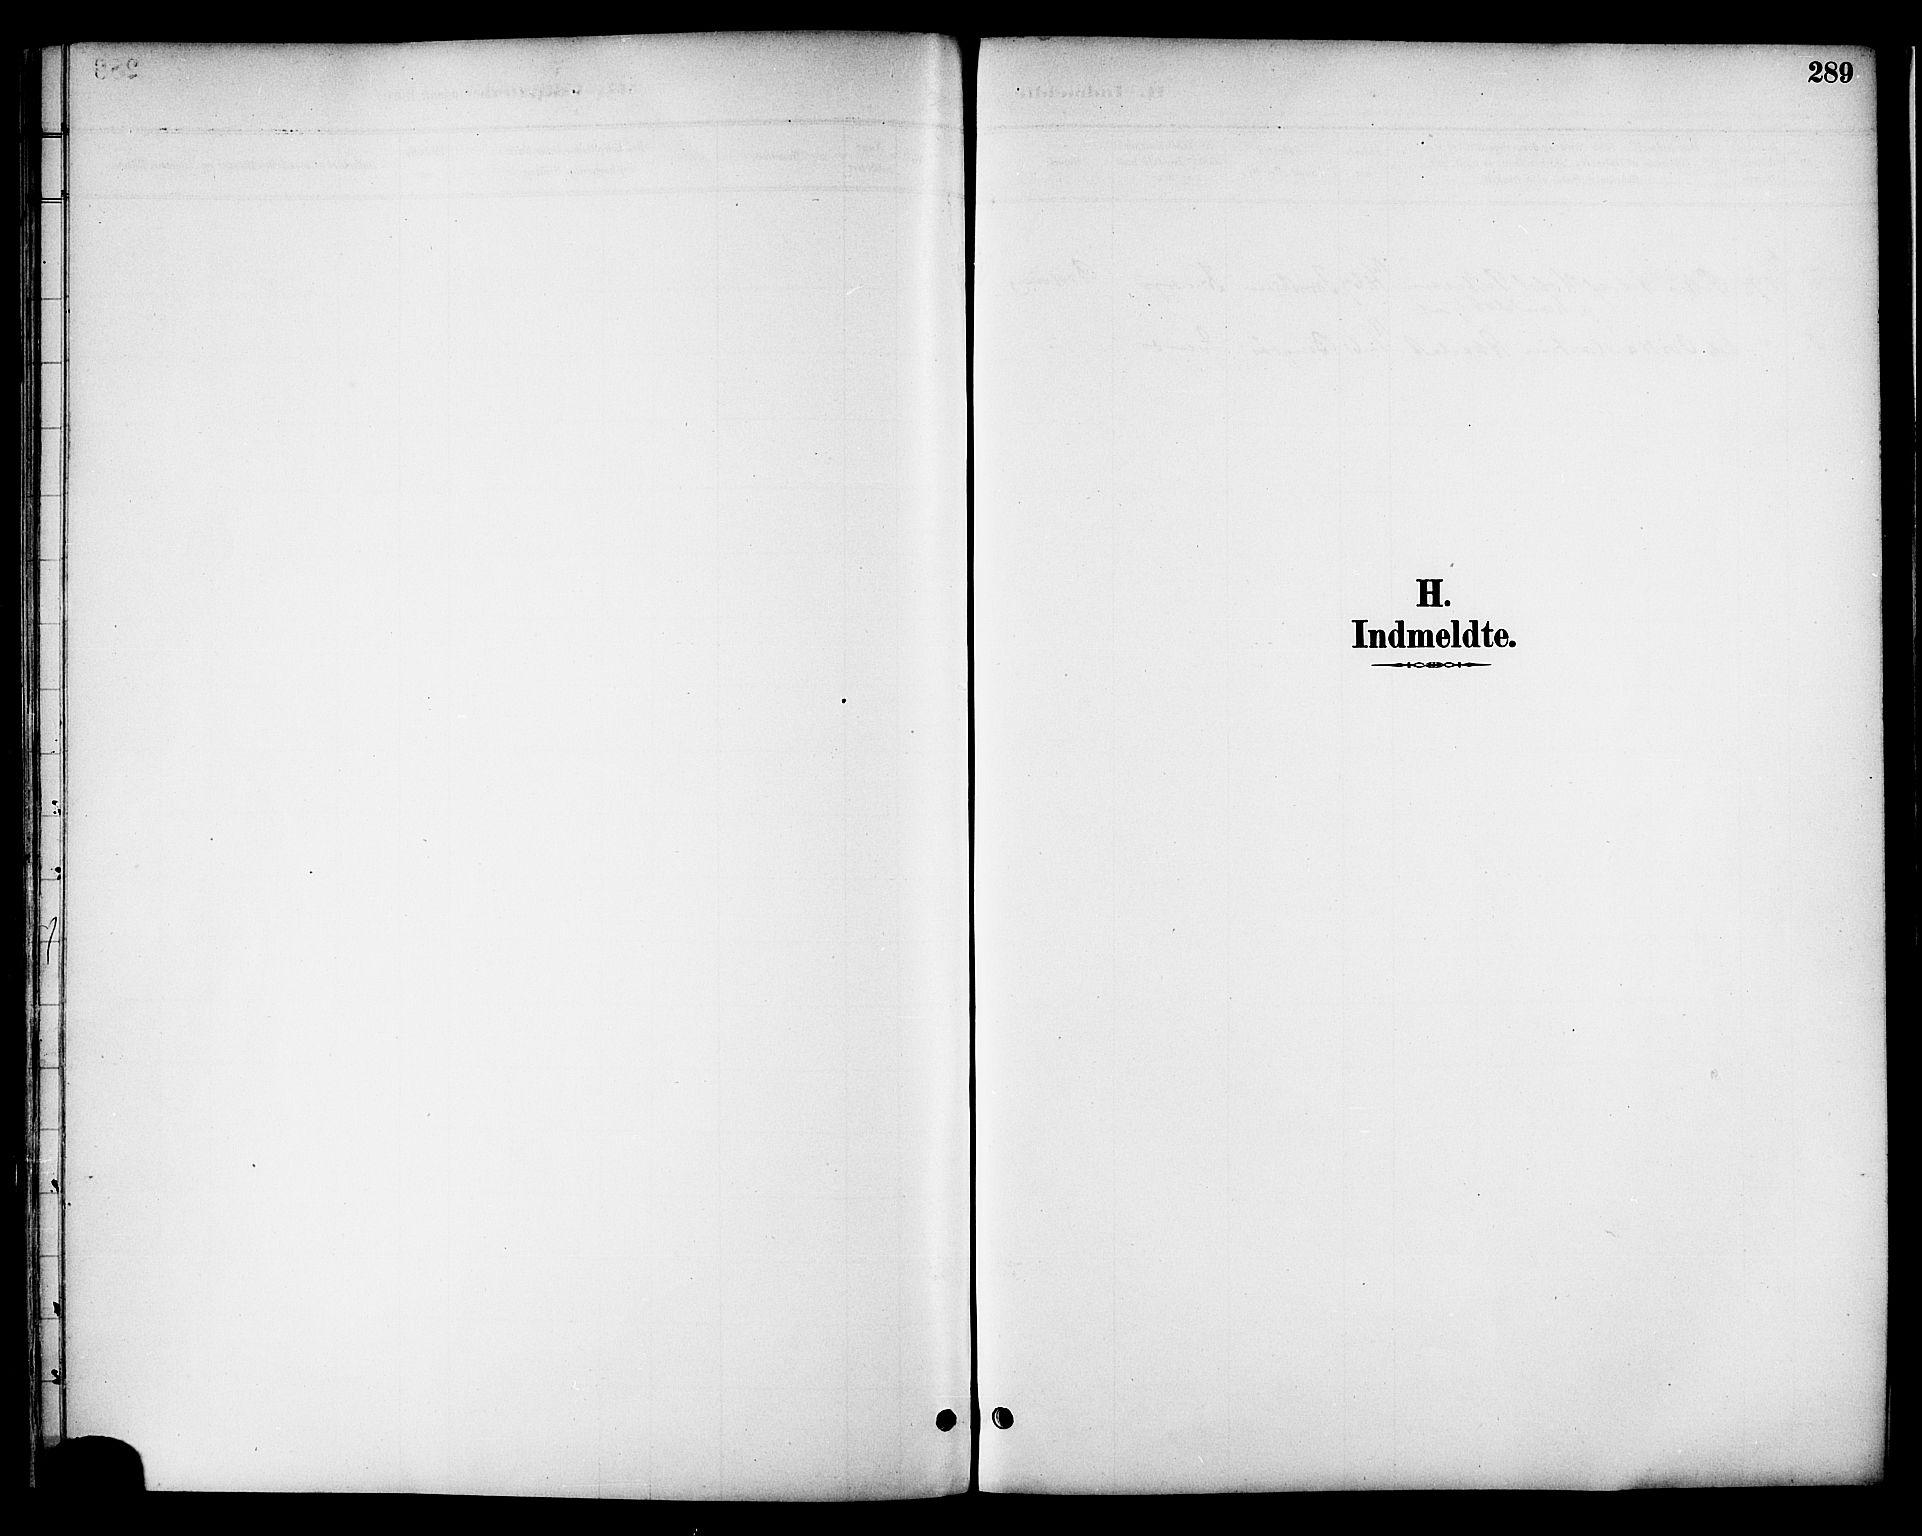 SAT, Ministerialprotokoller, klokkerbøker og fødselsregistre - Nordland, 863/L0898: Ministerialbok nr. 863A10, 1886-1897, s. 289